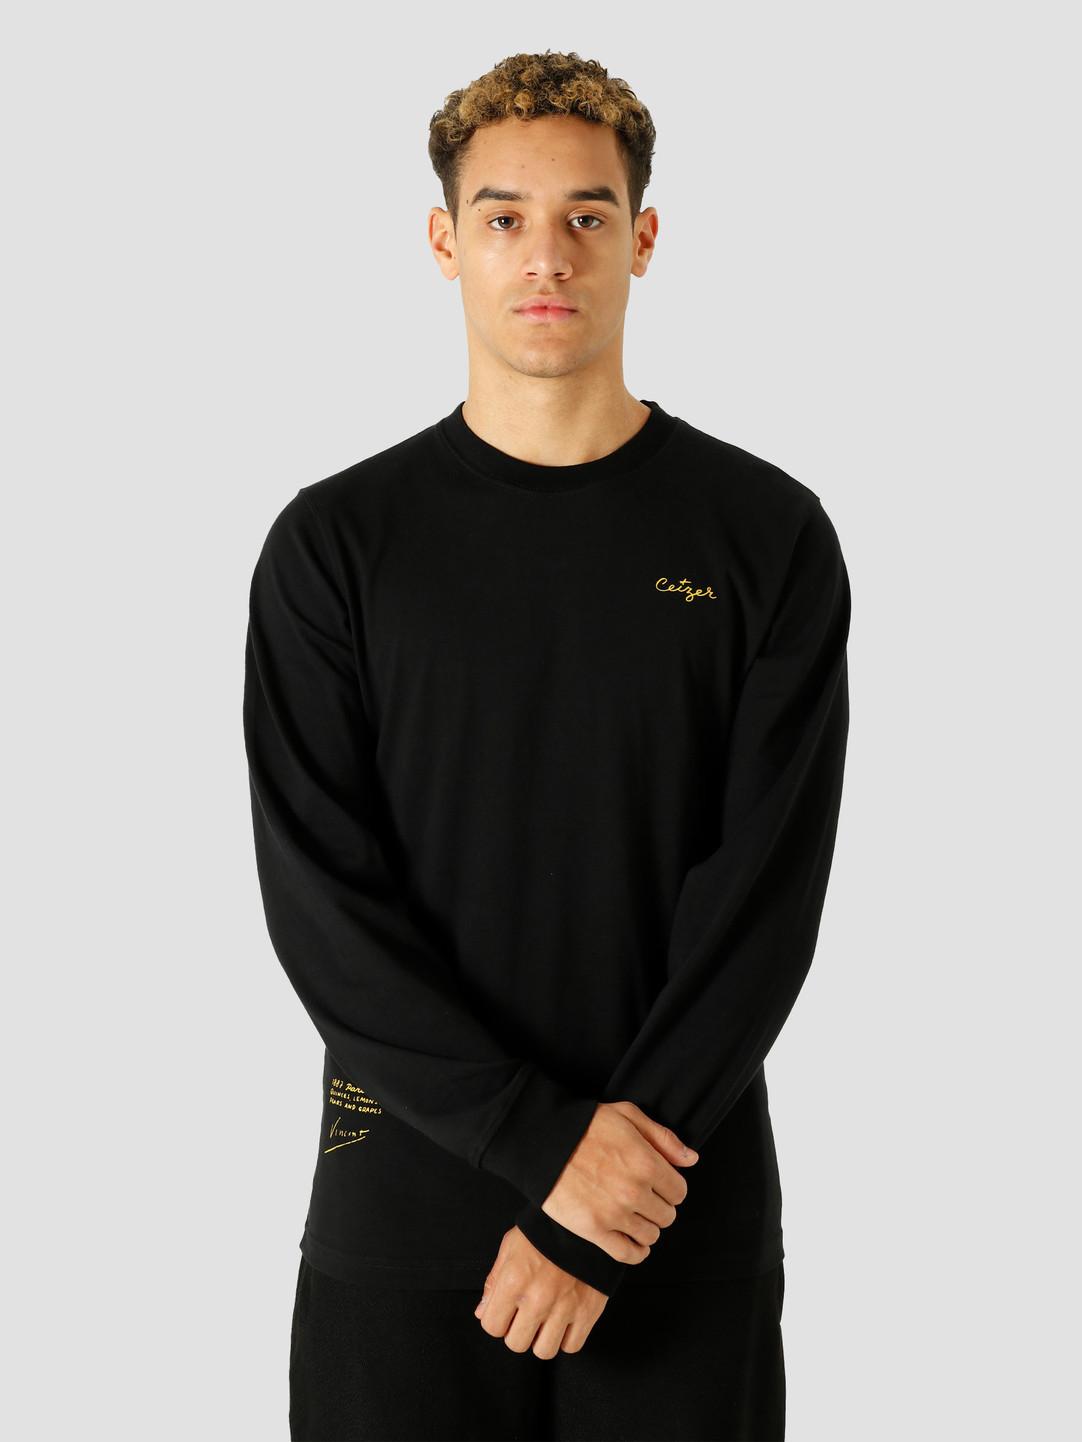 Ceizer Ceizer Study & Sketch Longsleeve T-Shirt Black VG003